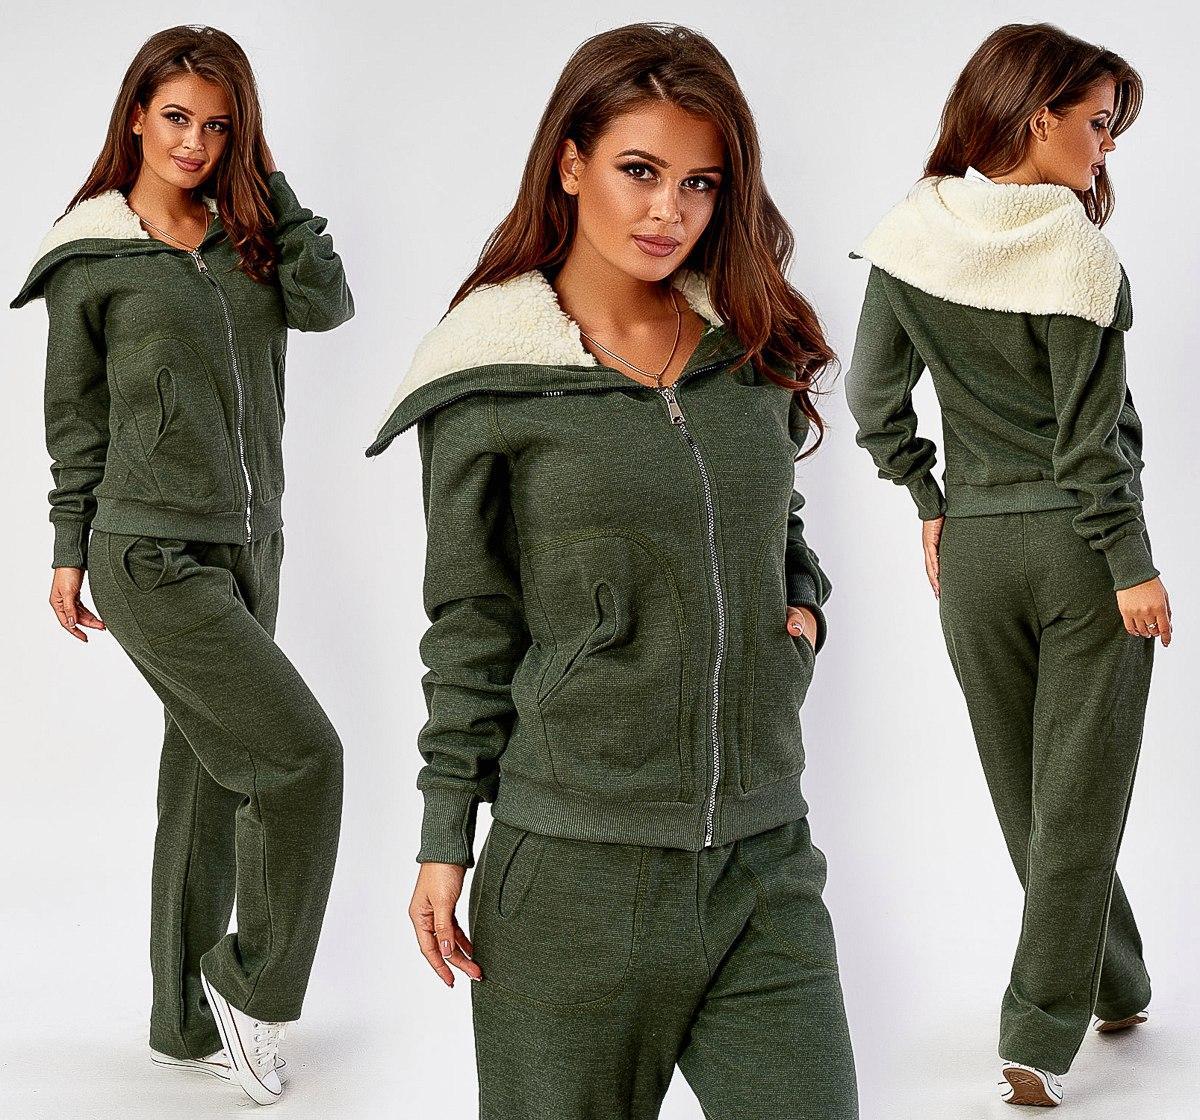 265f8e1278e Женский спортивный костюм   трехнитка петля